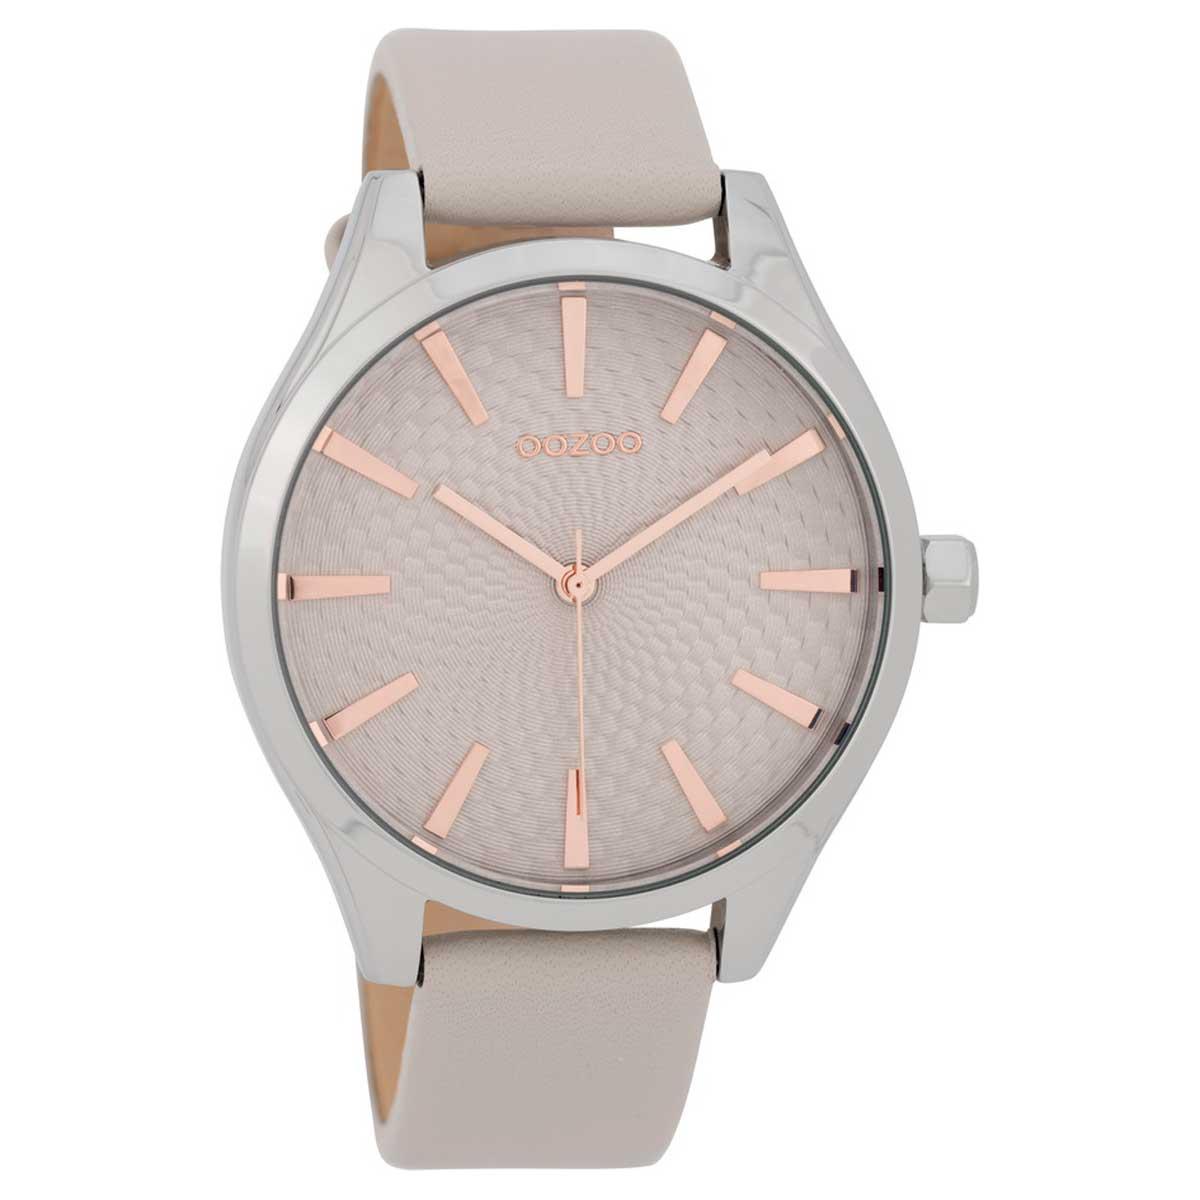 OOZOO Timepieces C9685 γυναικείο ρολόι με ασημί μεταλλική κάσα και γκρι  δερμάτινο λουράκι 174da17e57b